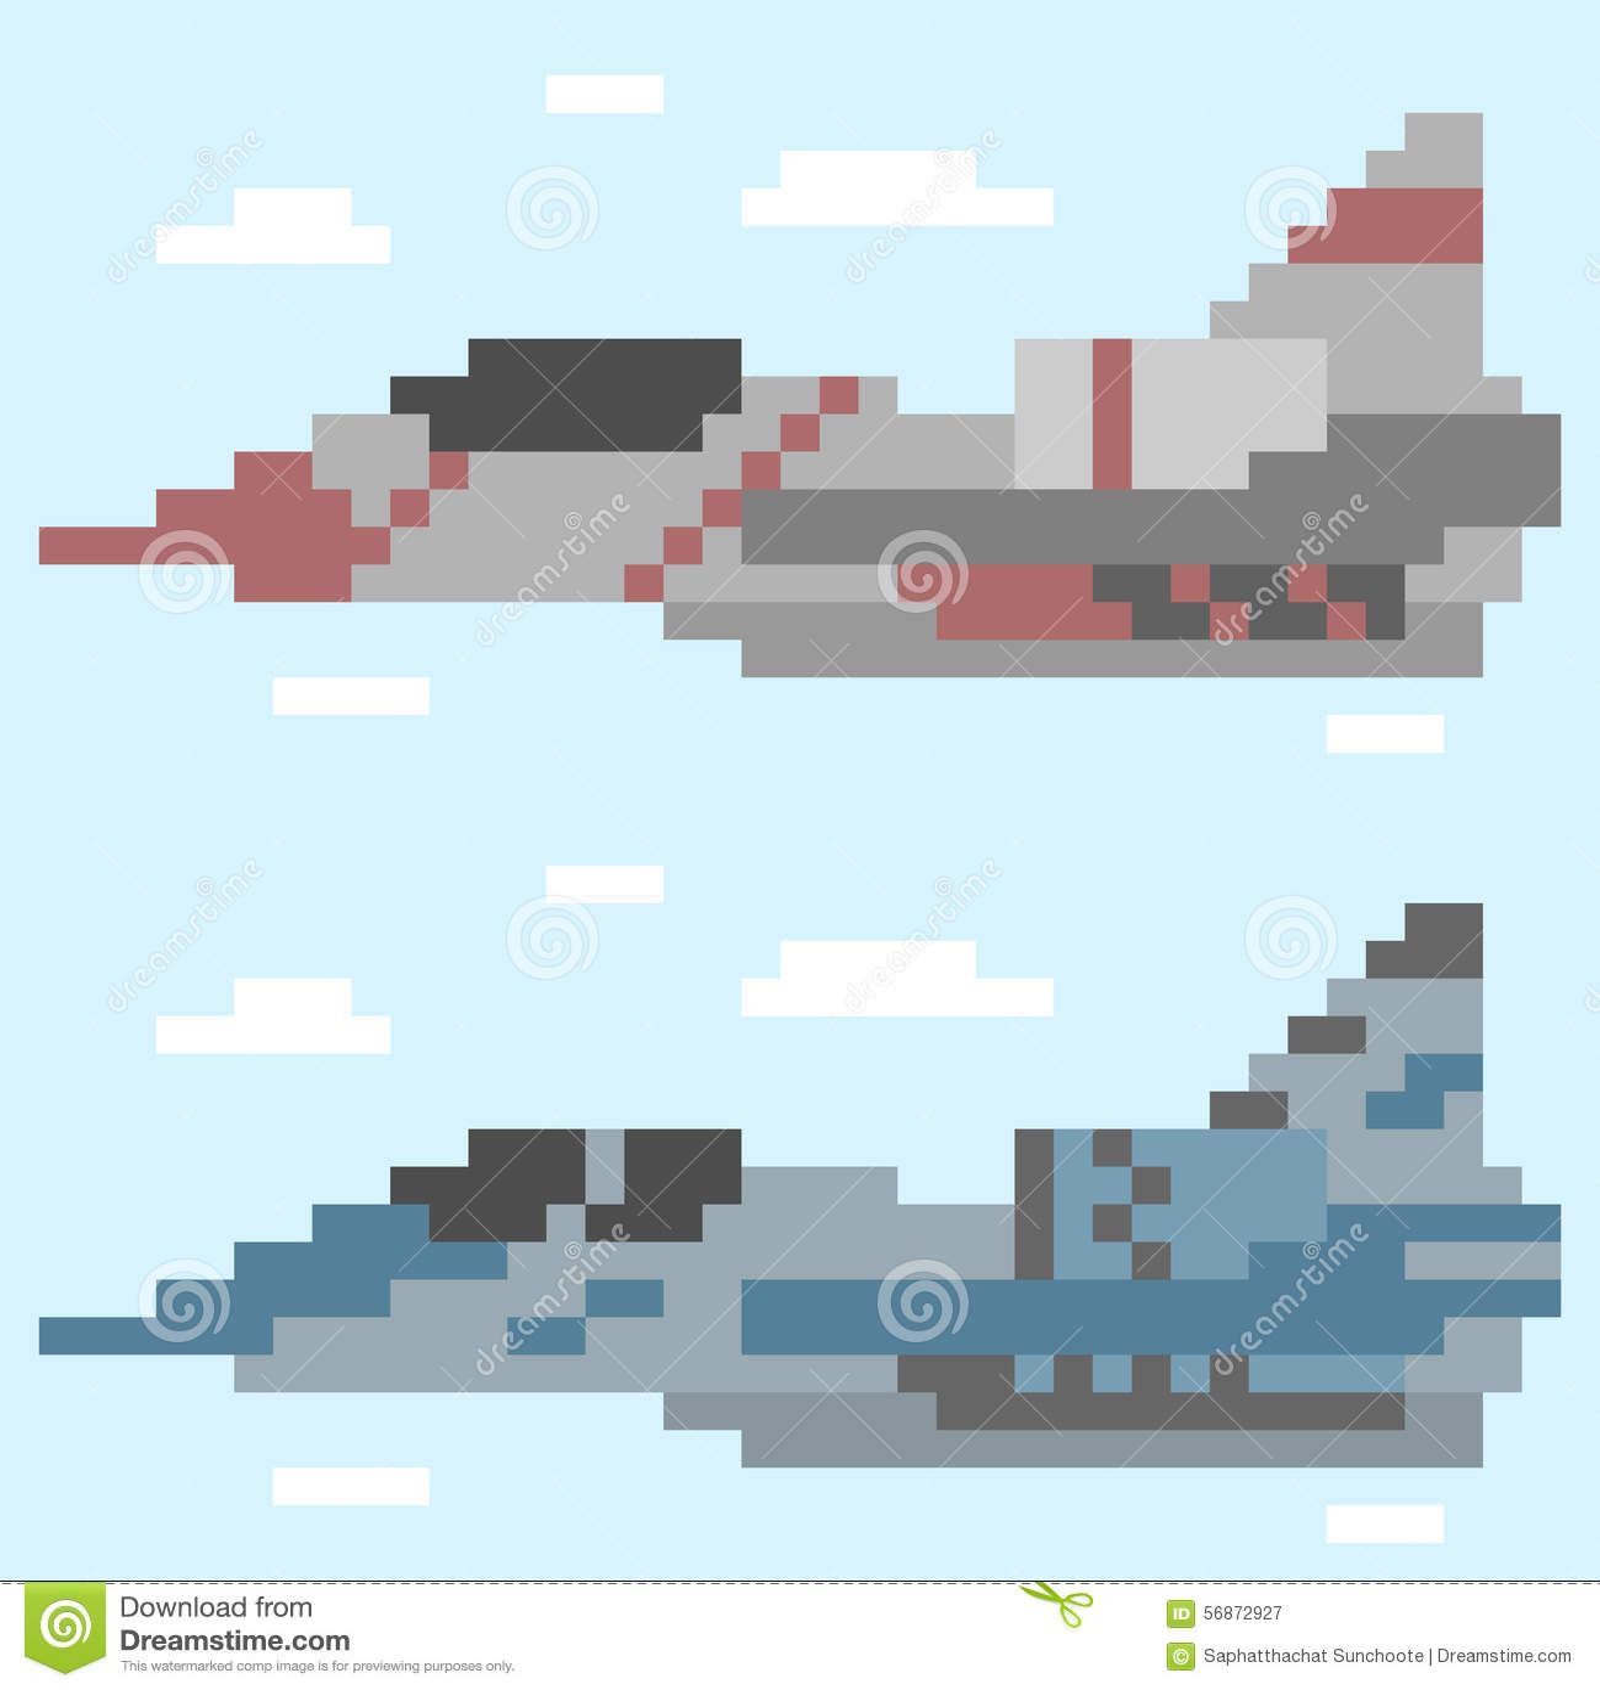 avion d 39 art de pixel d 39 illustration illustration de vecteur illustration du nuages warplane. Black Bedroom Furniture Sets. Home Design Ideas